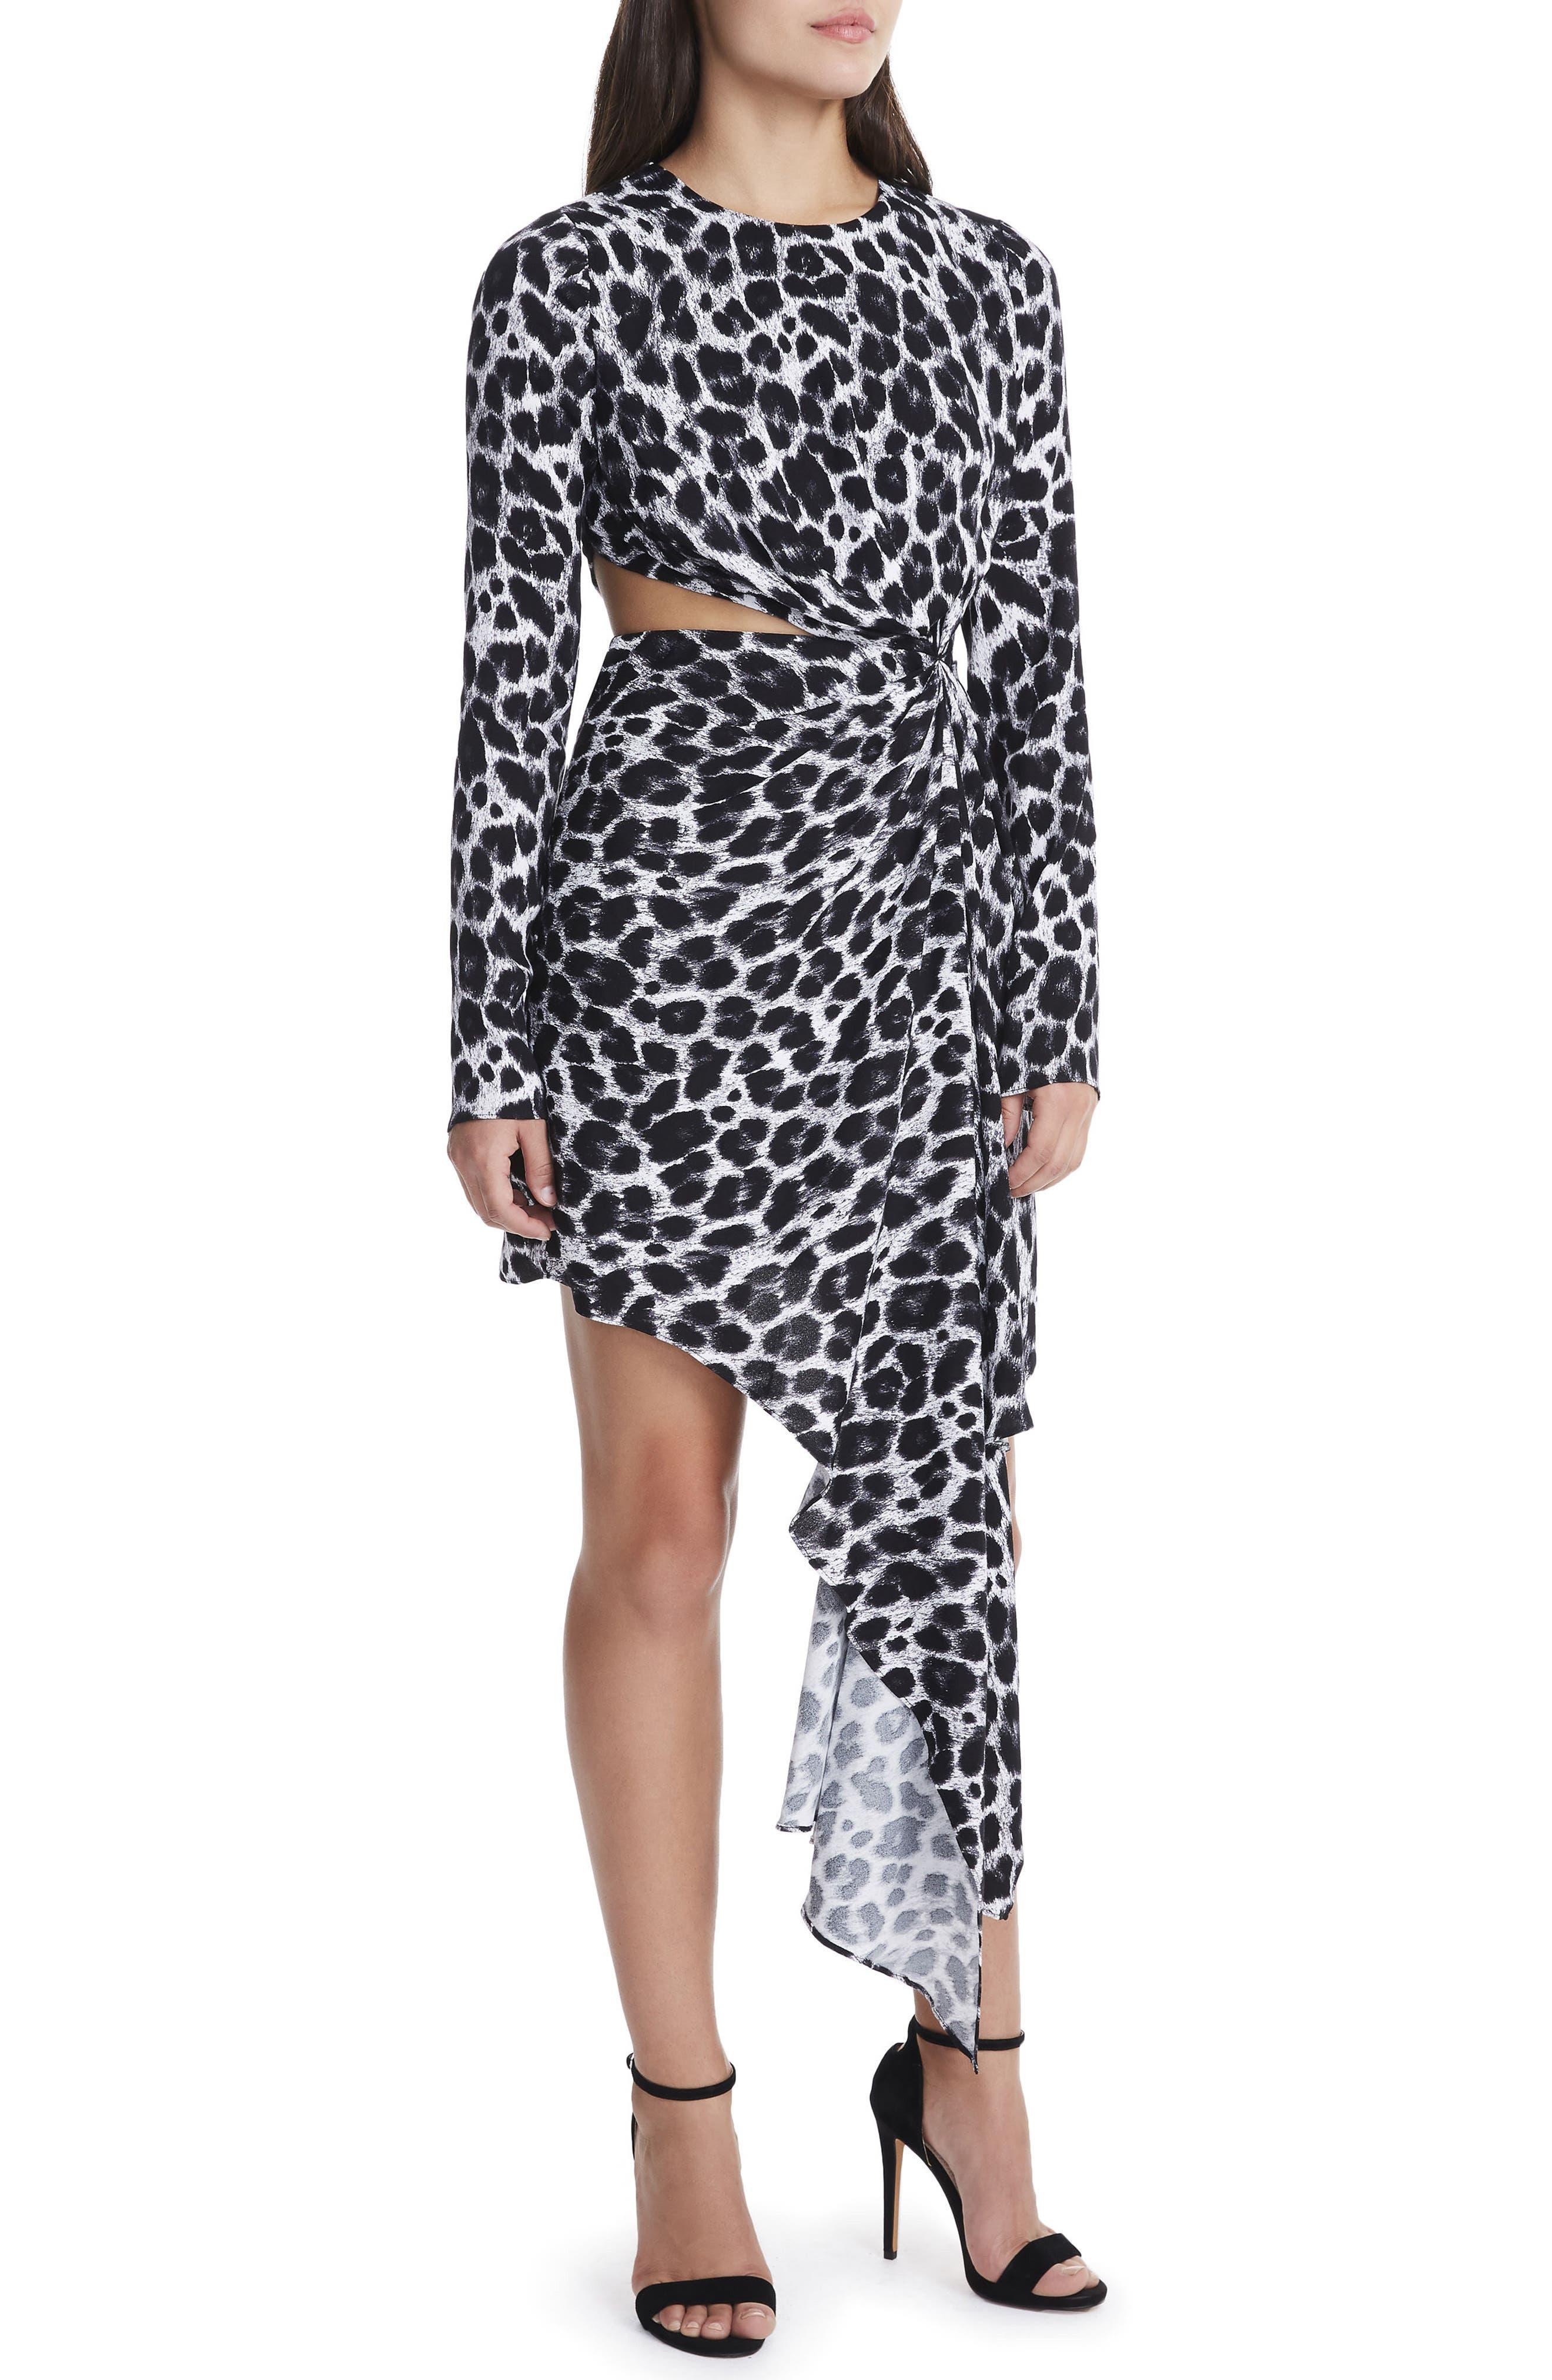 Alternate Image 1 Selected - AFRM Amos Cutout Dress